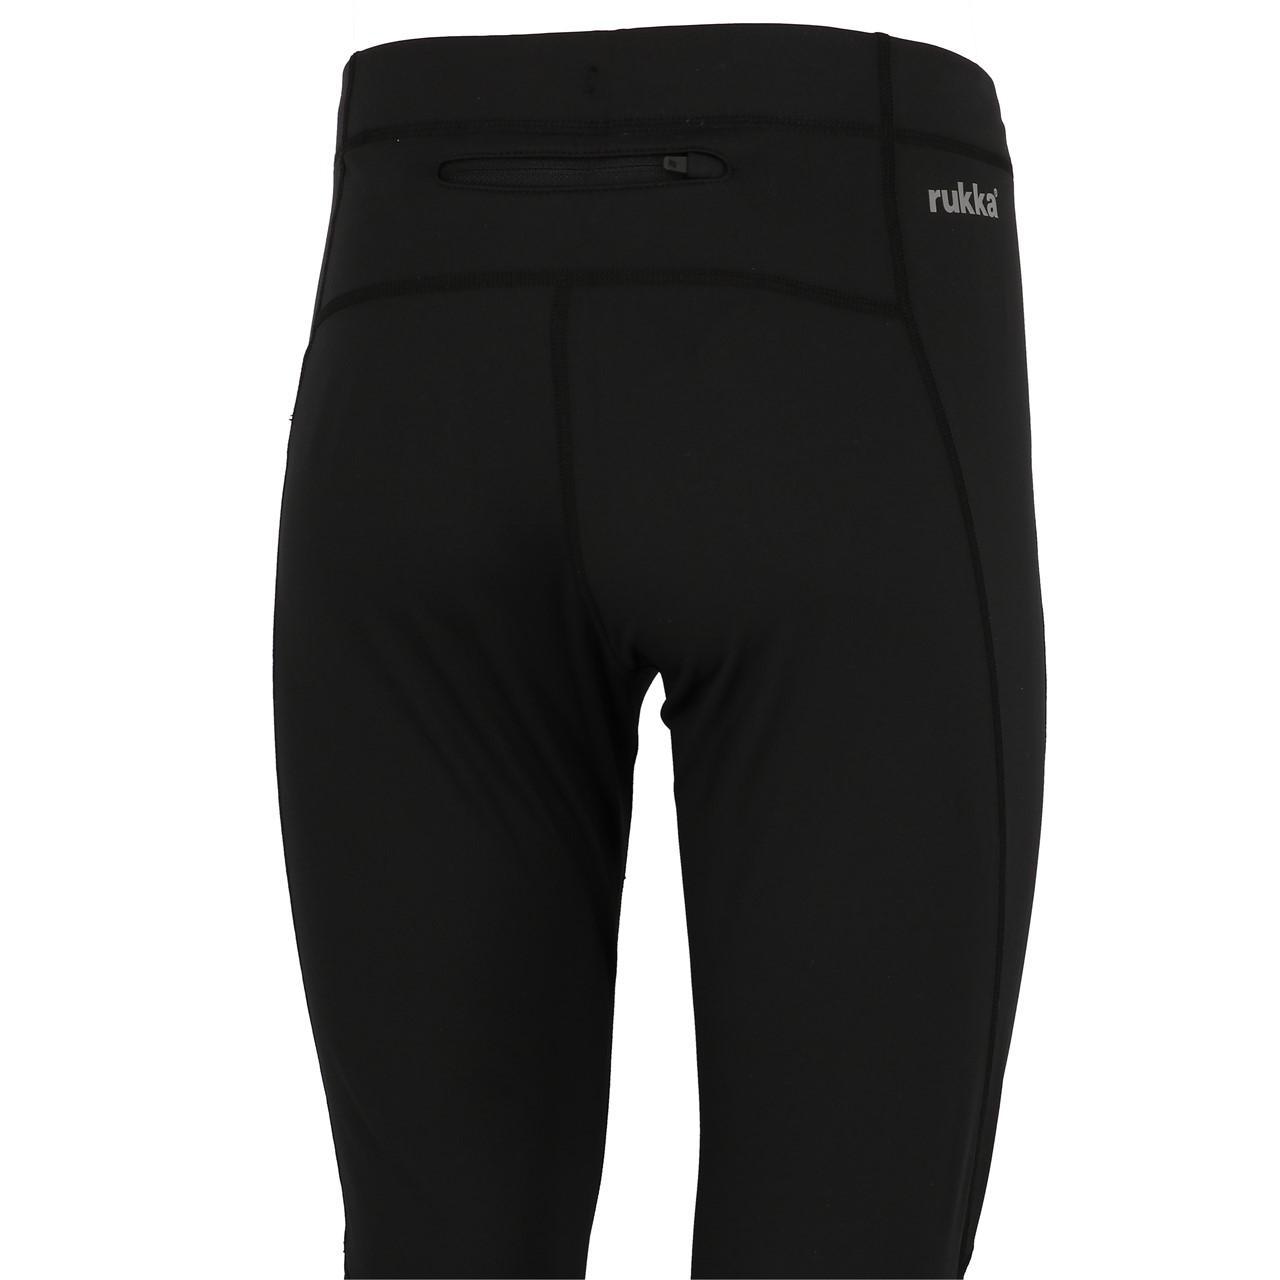 Legging-Sport-Rukka-Jonah-Blk-Tight-Run-Schwarz-25715-Neu Indexbild 3